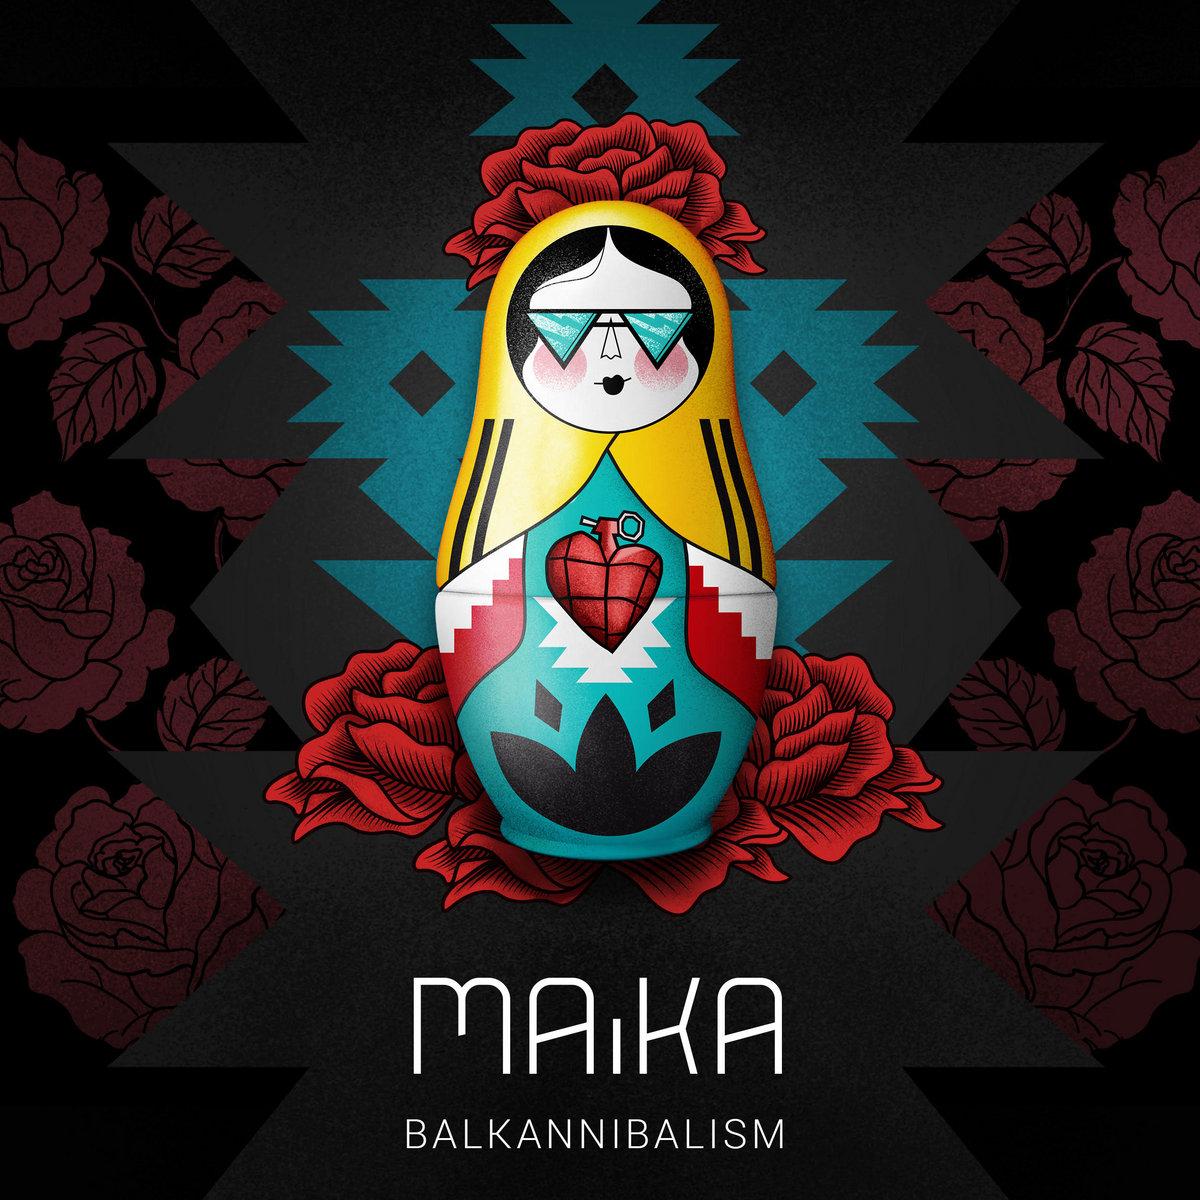 Balkannibalism | MAiKA